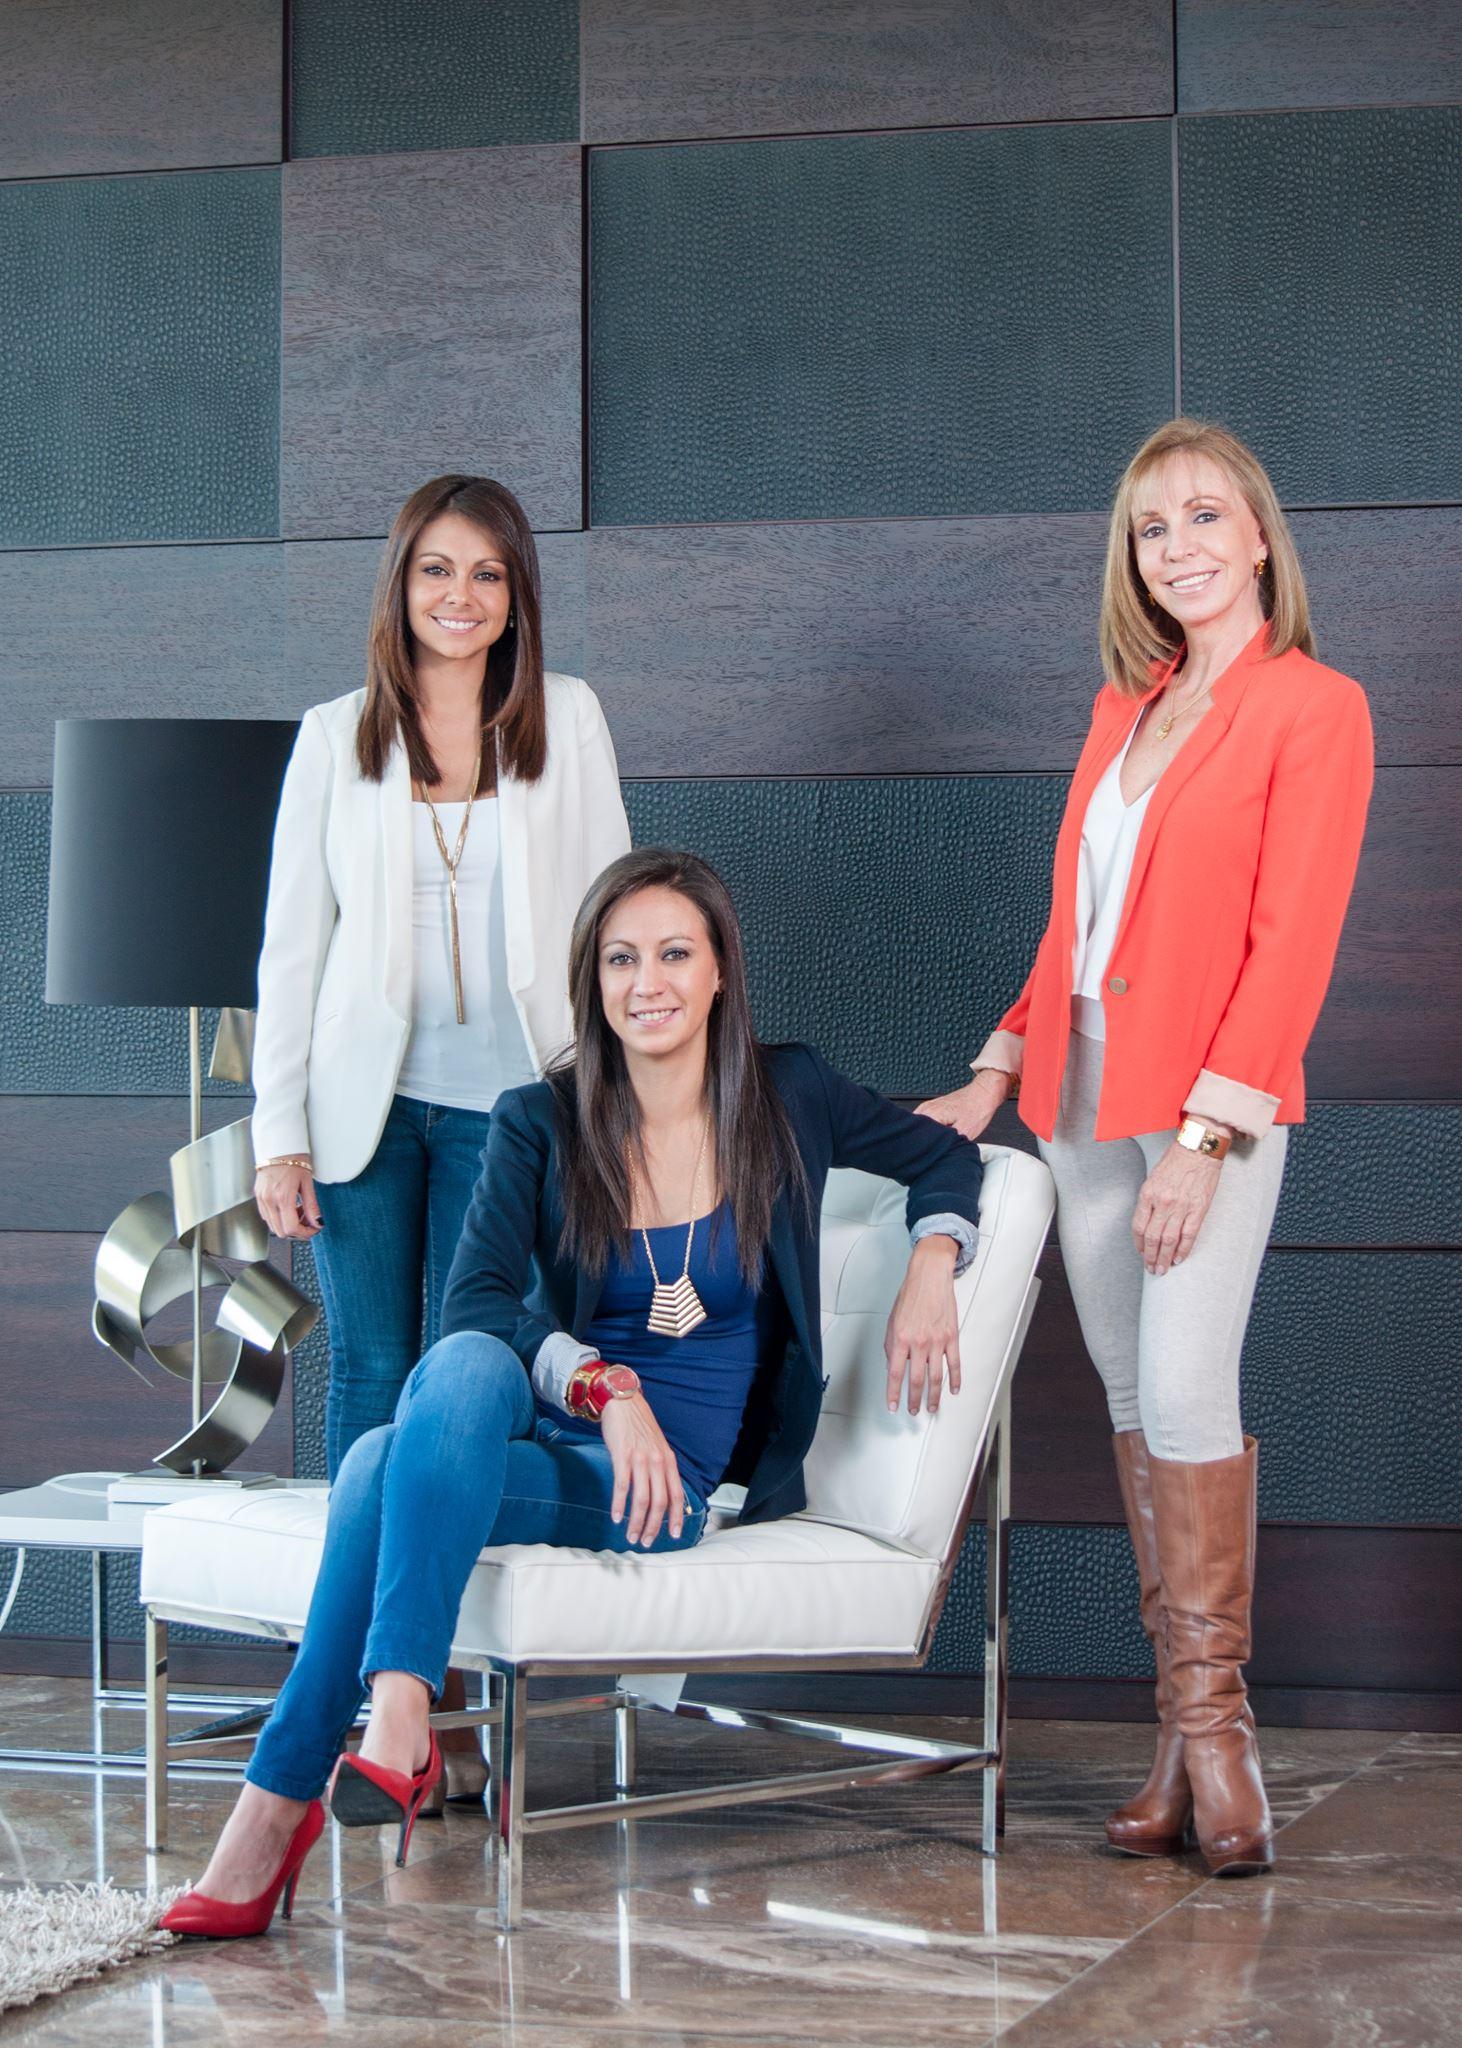 Mili Leon, Gabriela Leon, and Paulina Ramos